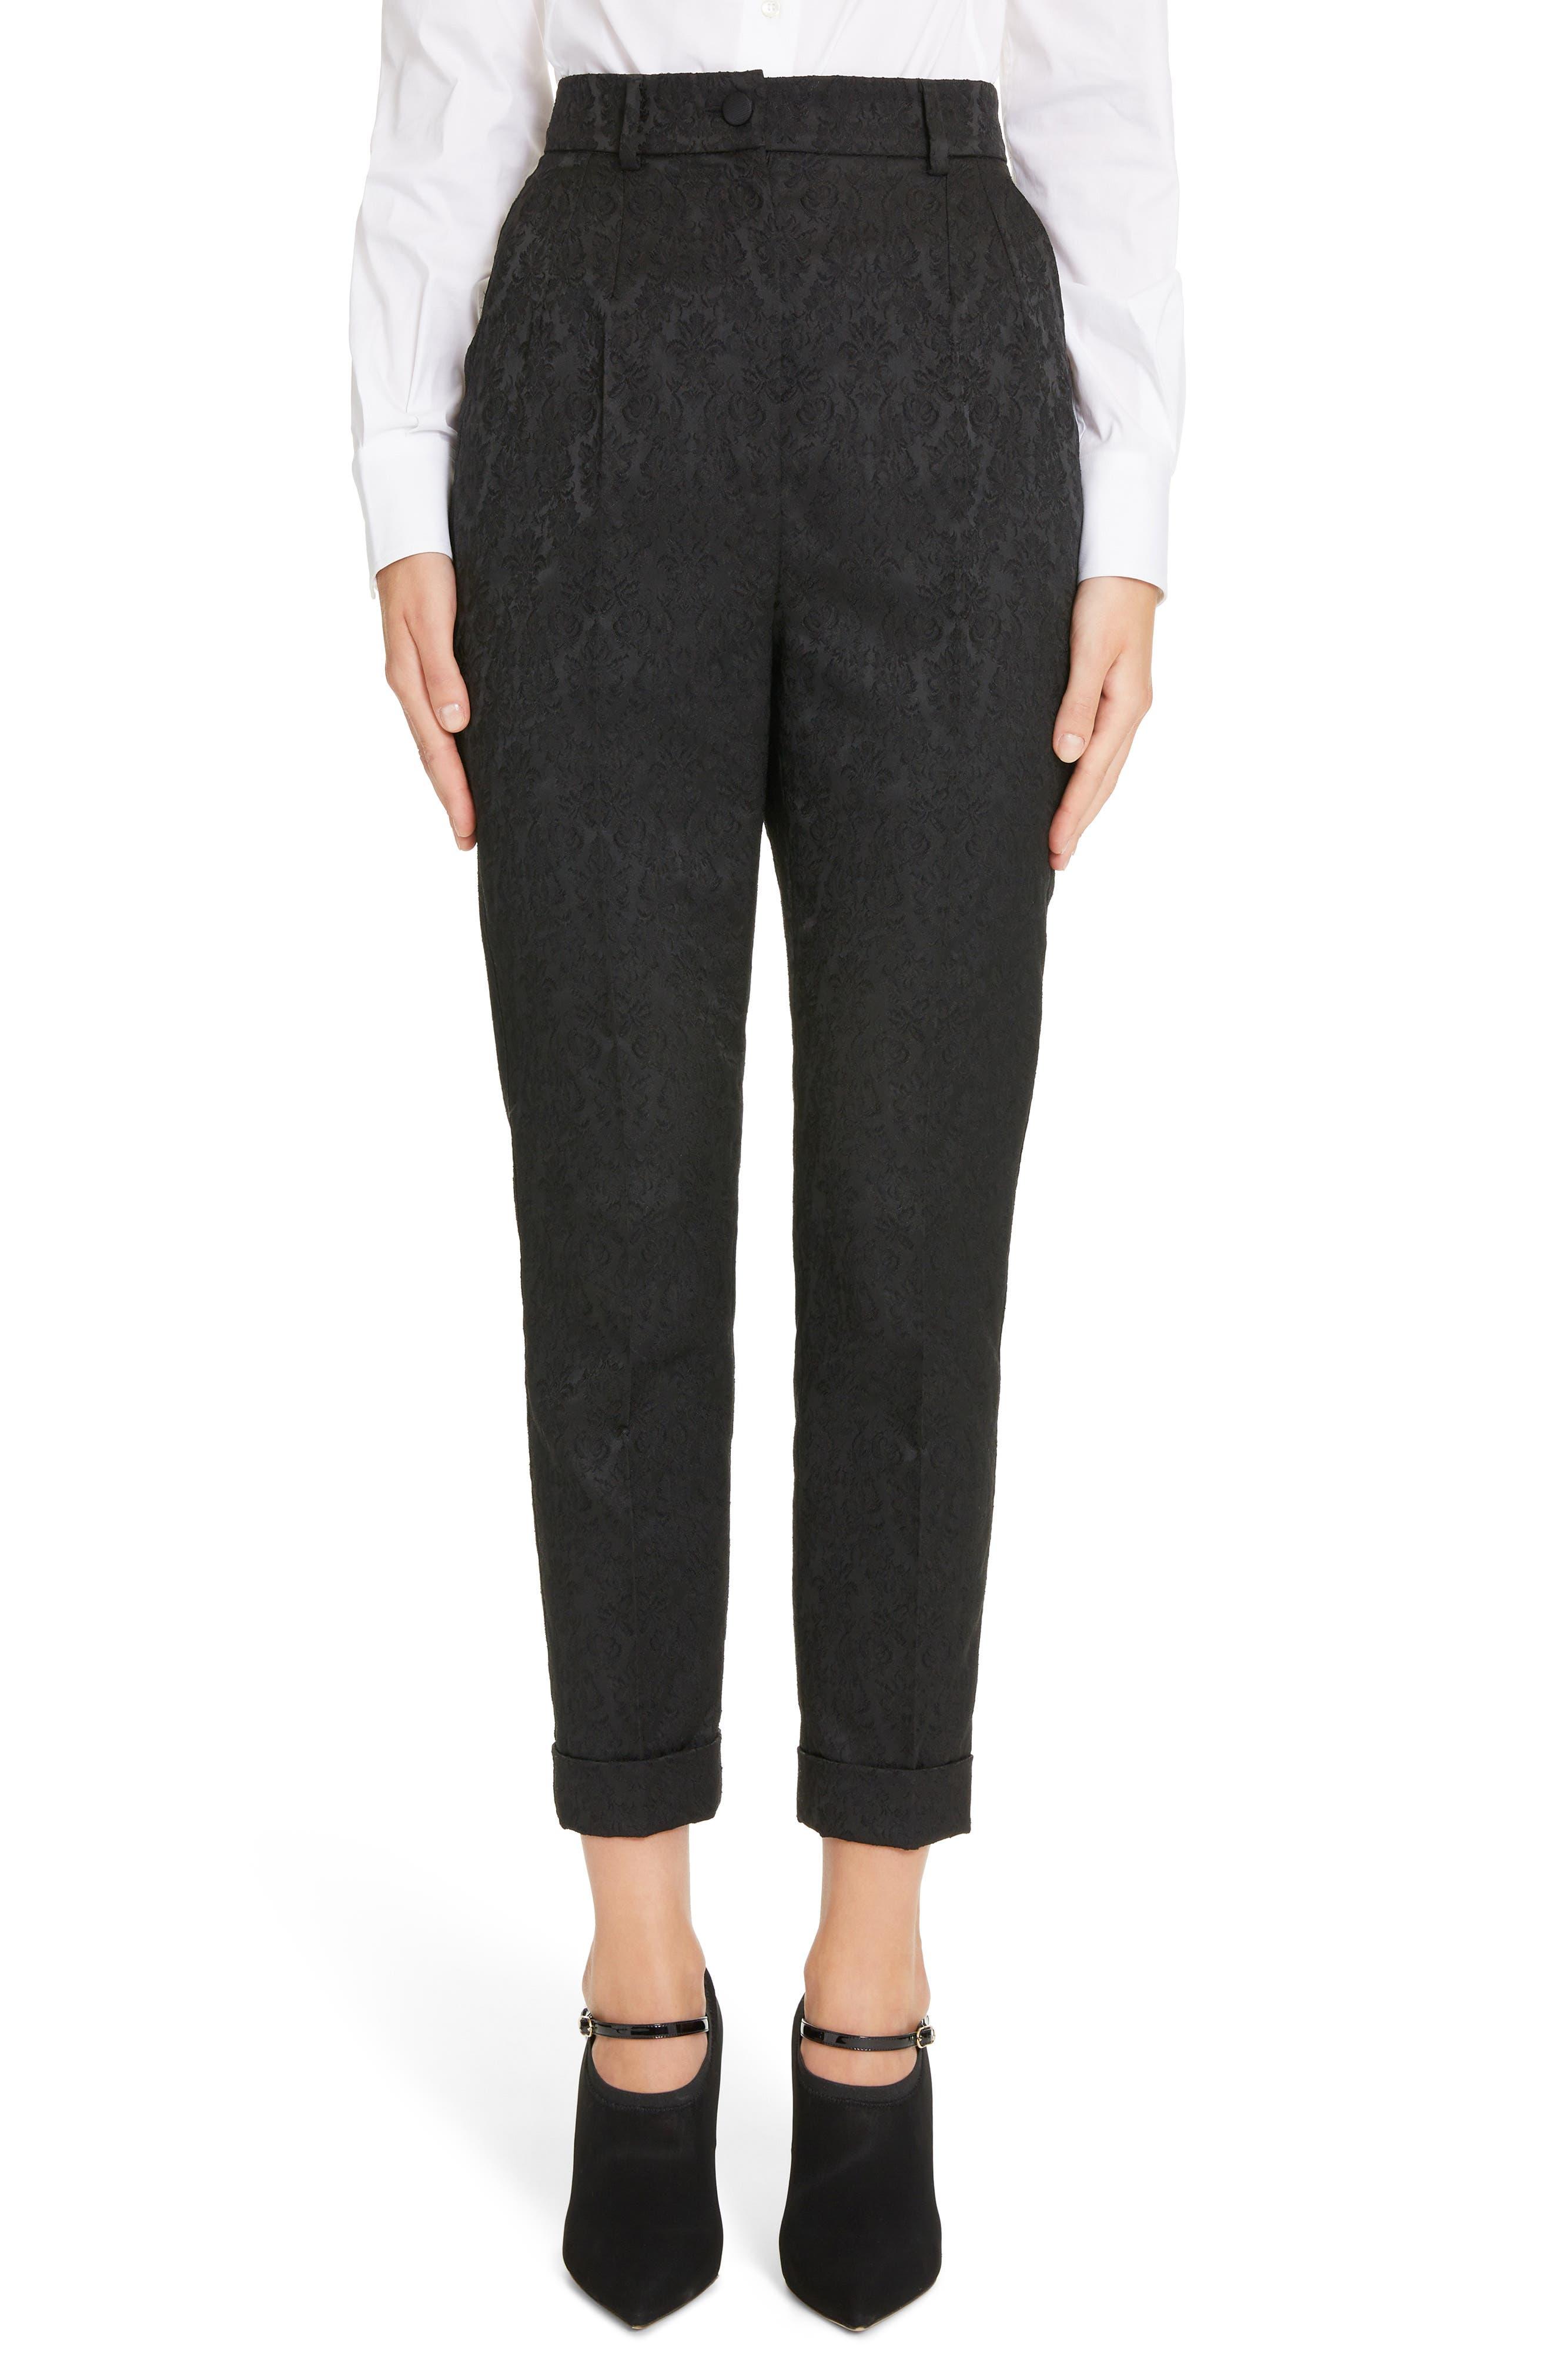 Jacquard Cuff Skinny Pants,                             Main thumbnail 1, color,                             N0000 BLACK